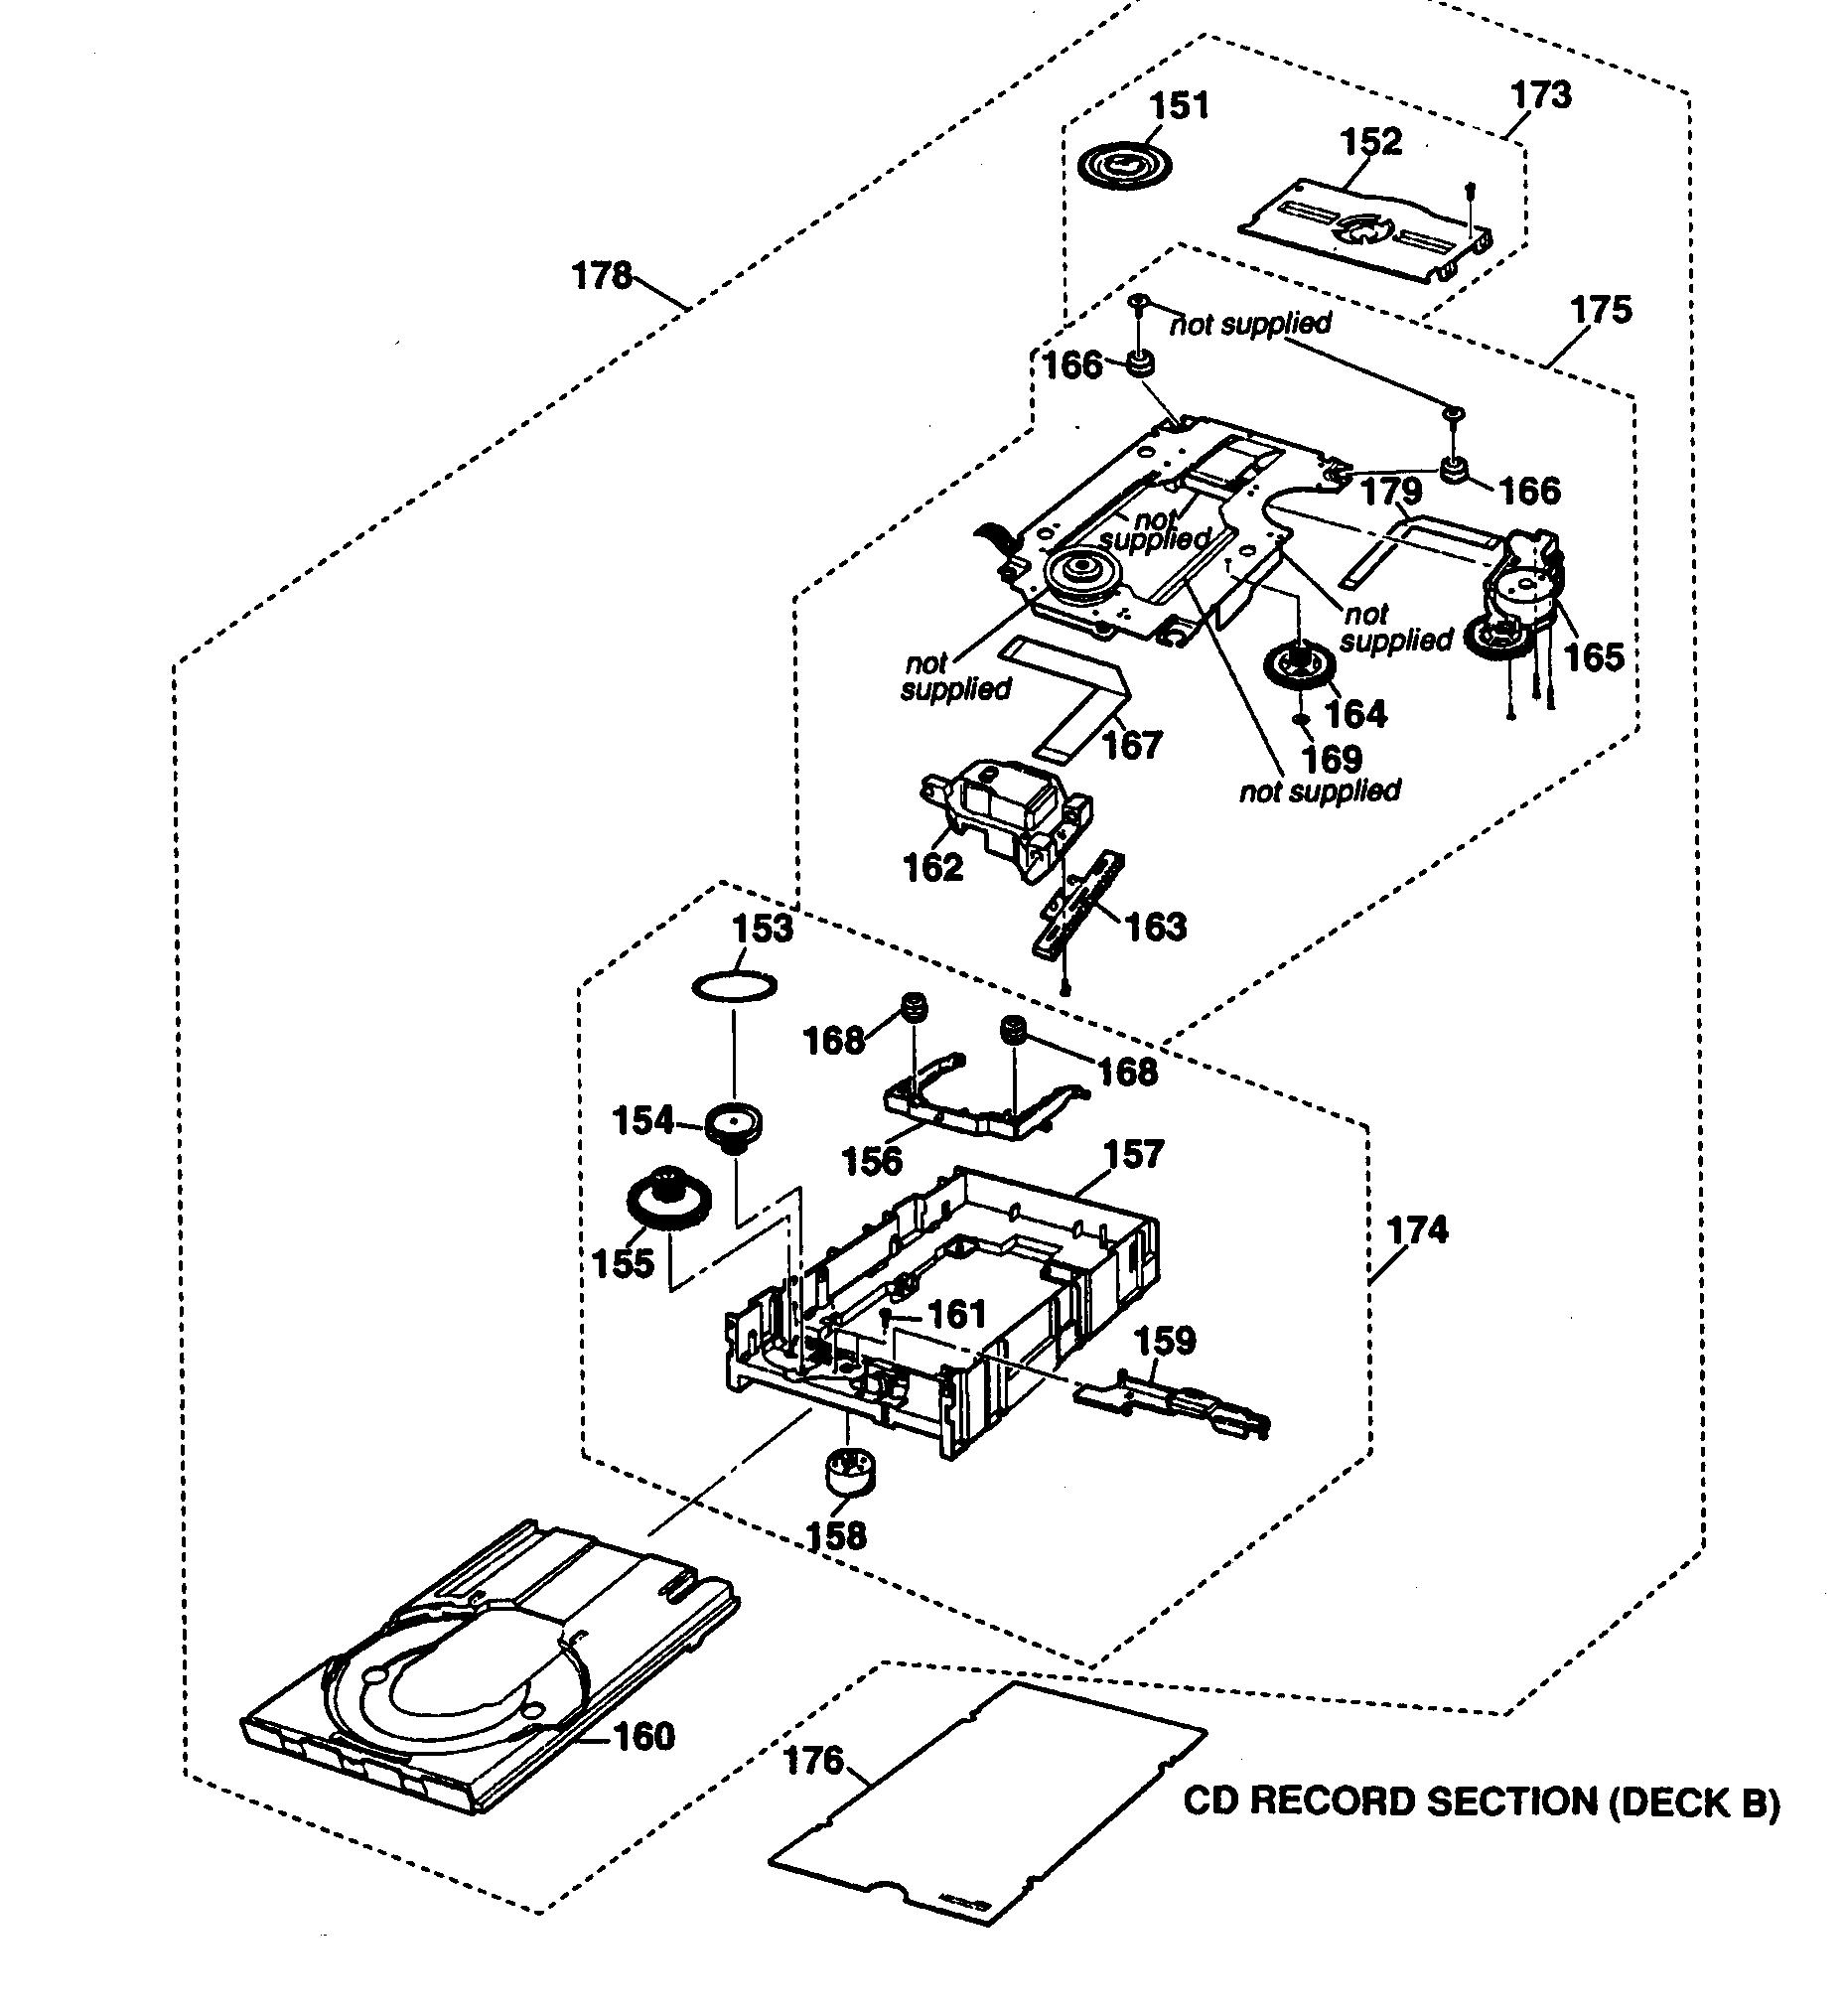 diagram fuse box school file gi35205 Isuzu Japan Bus schematic diagram of a usb player